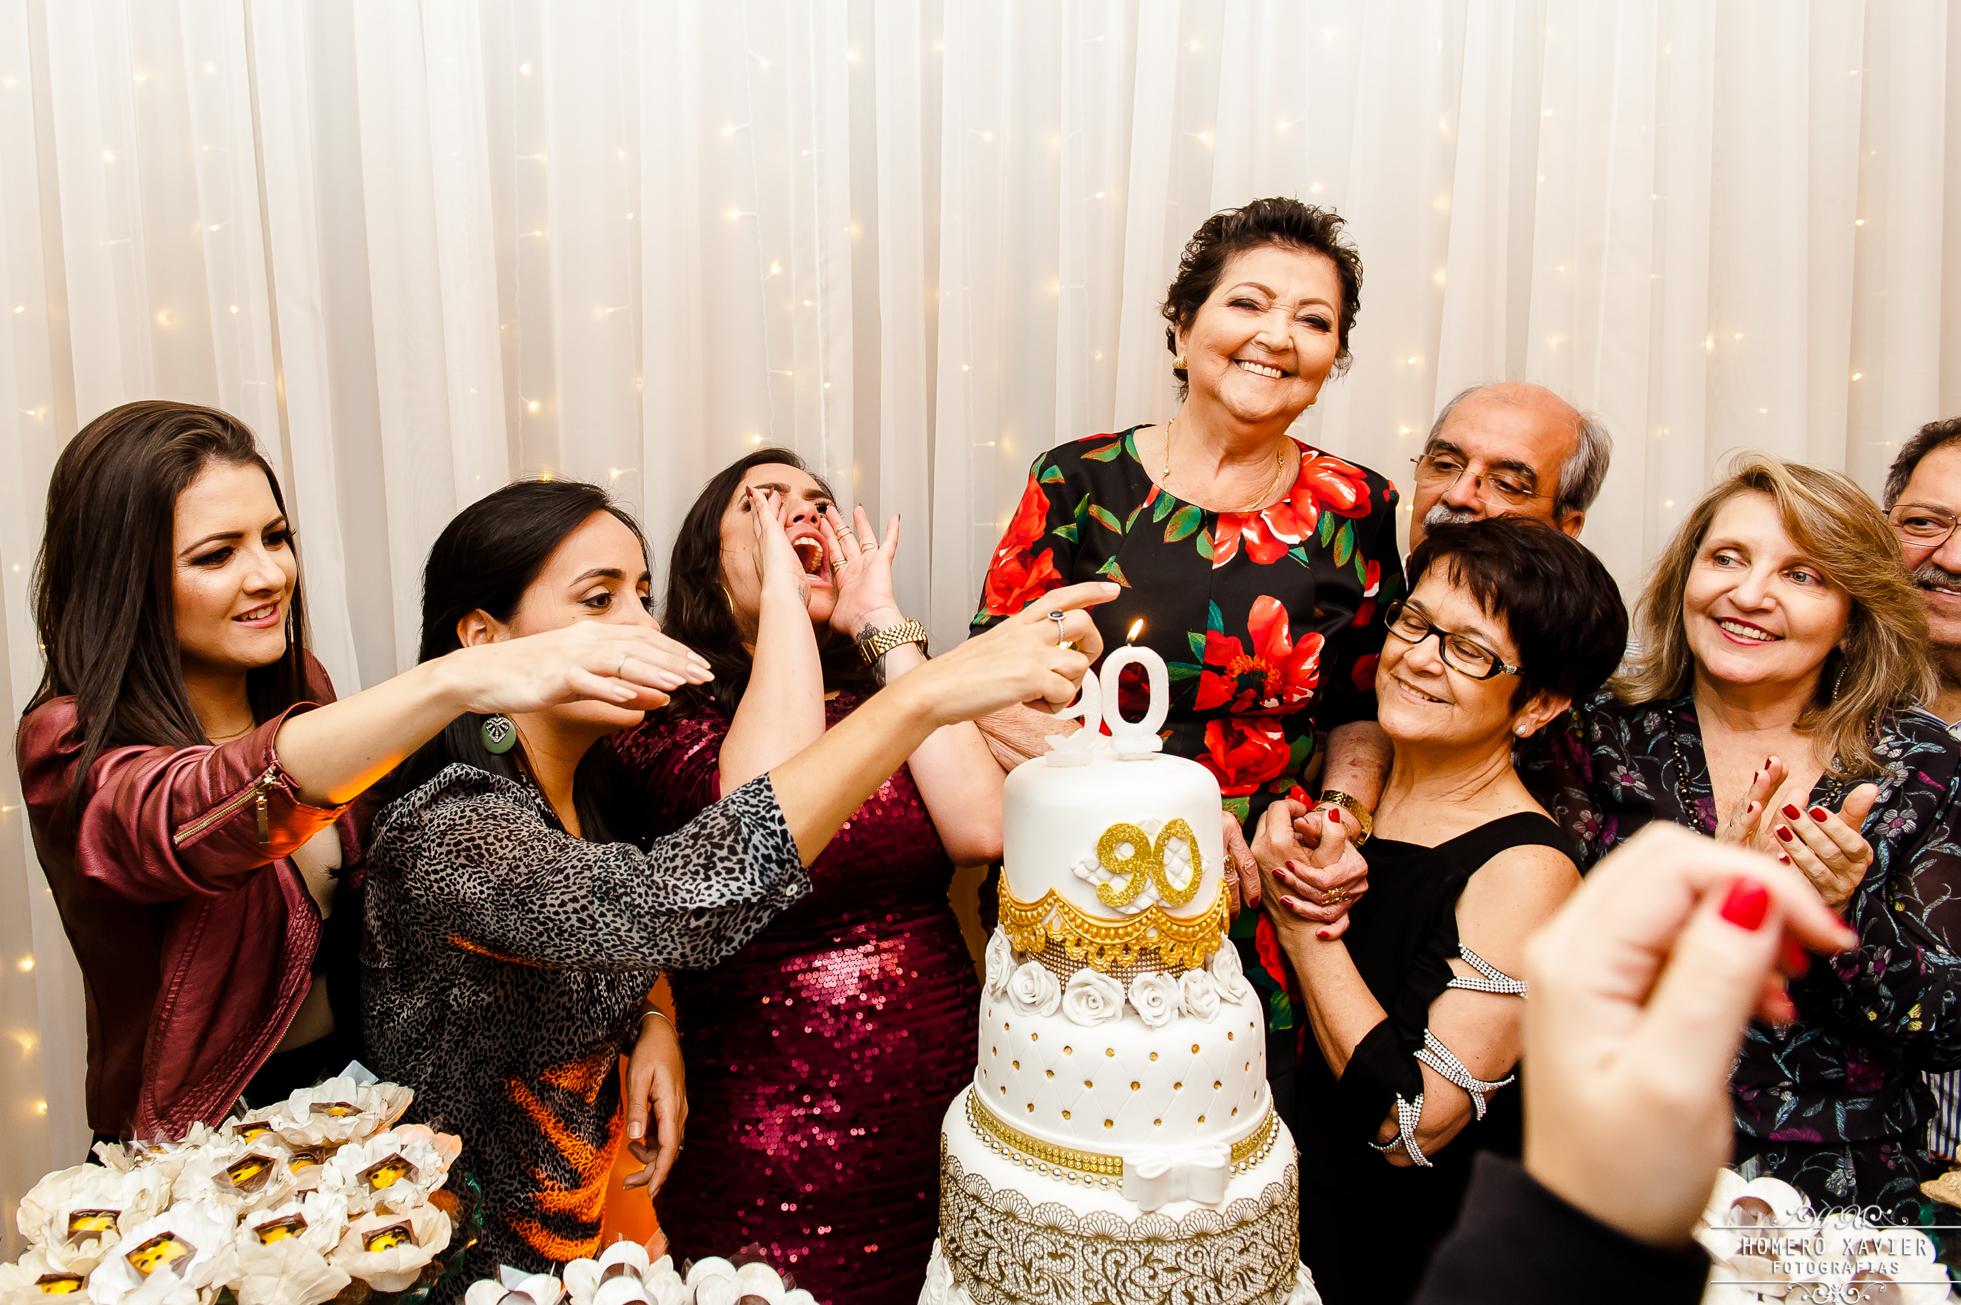 fotografia festa aniversario adulto bh